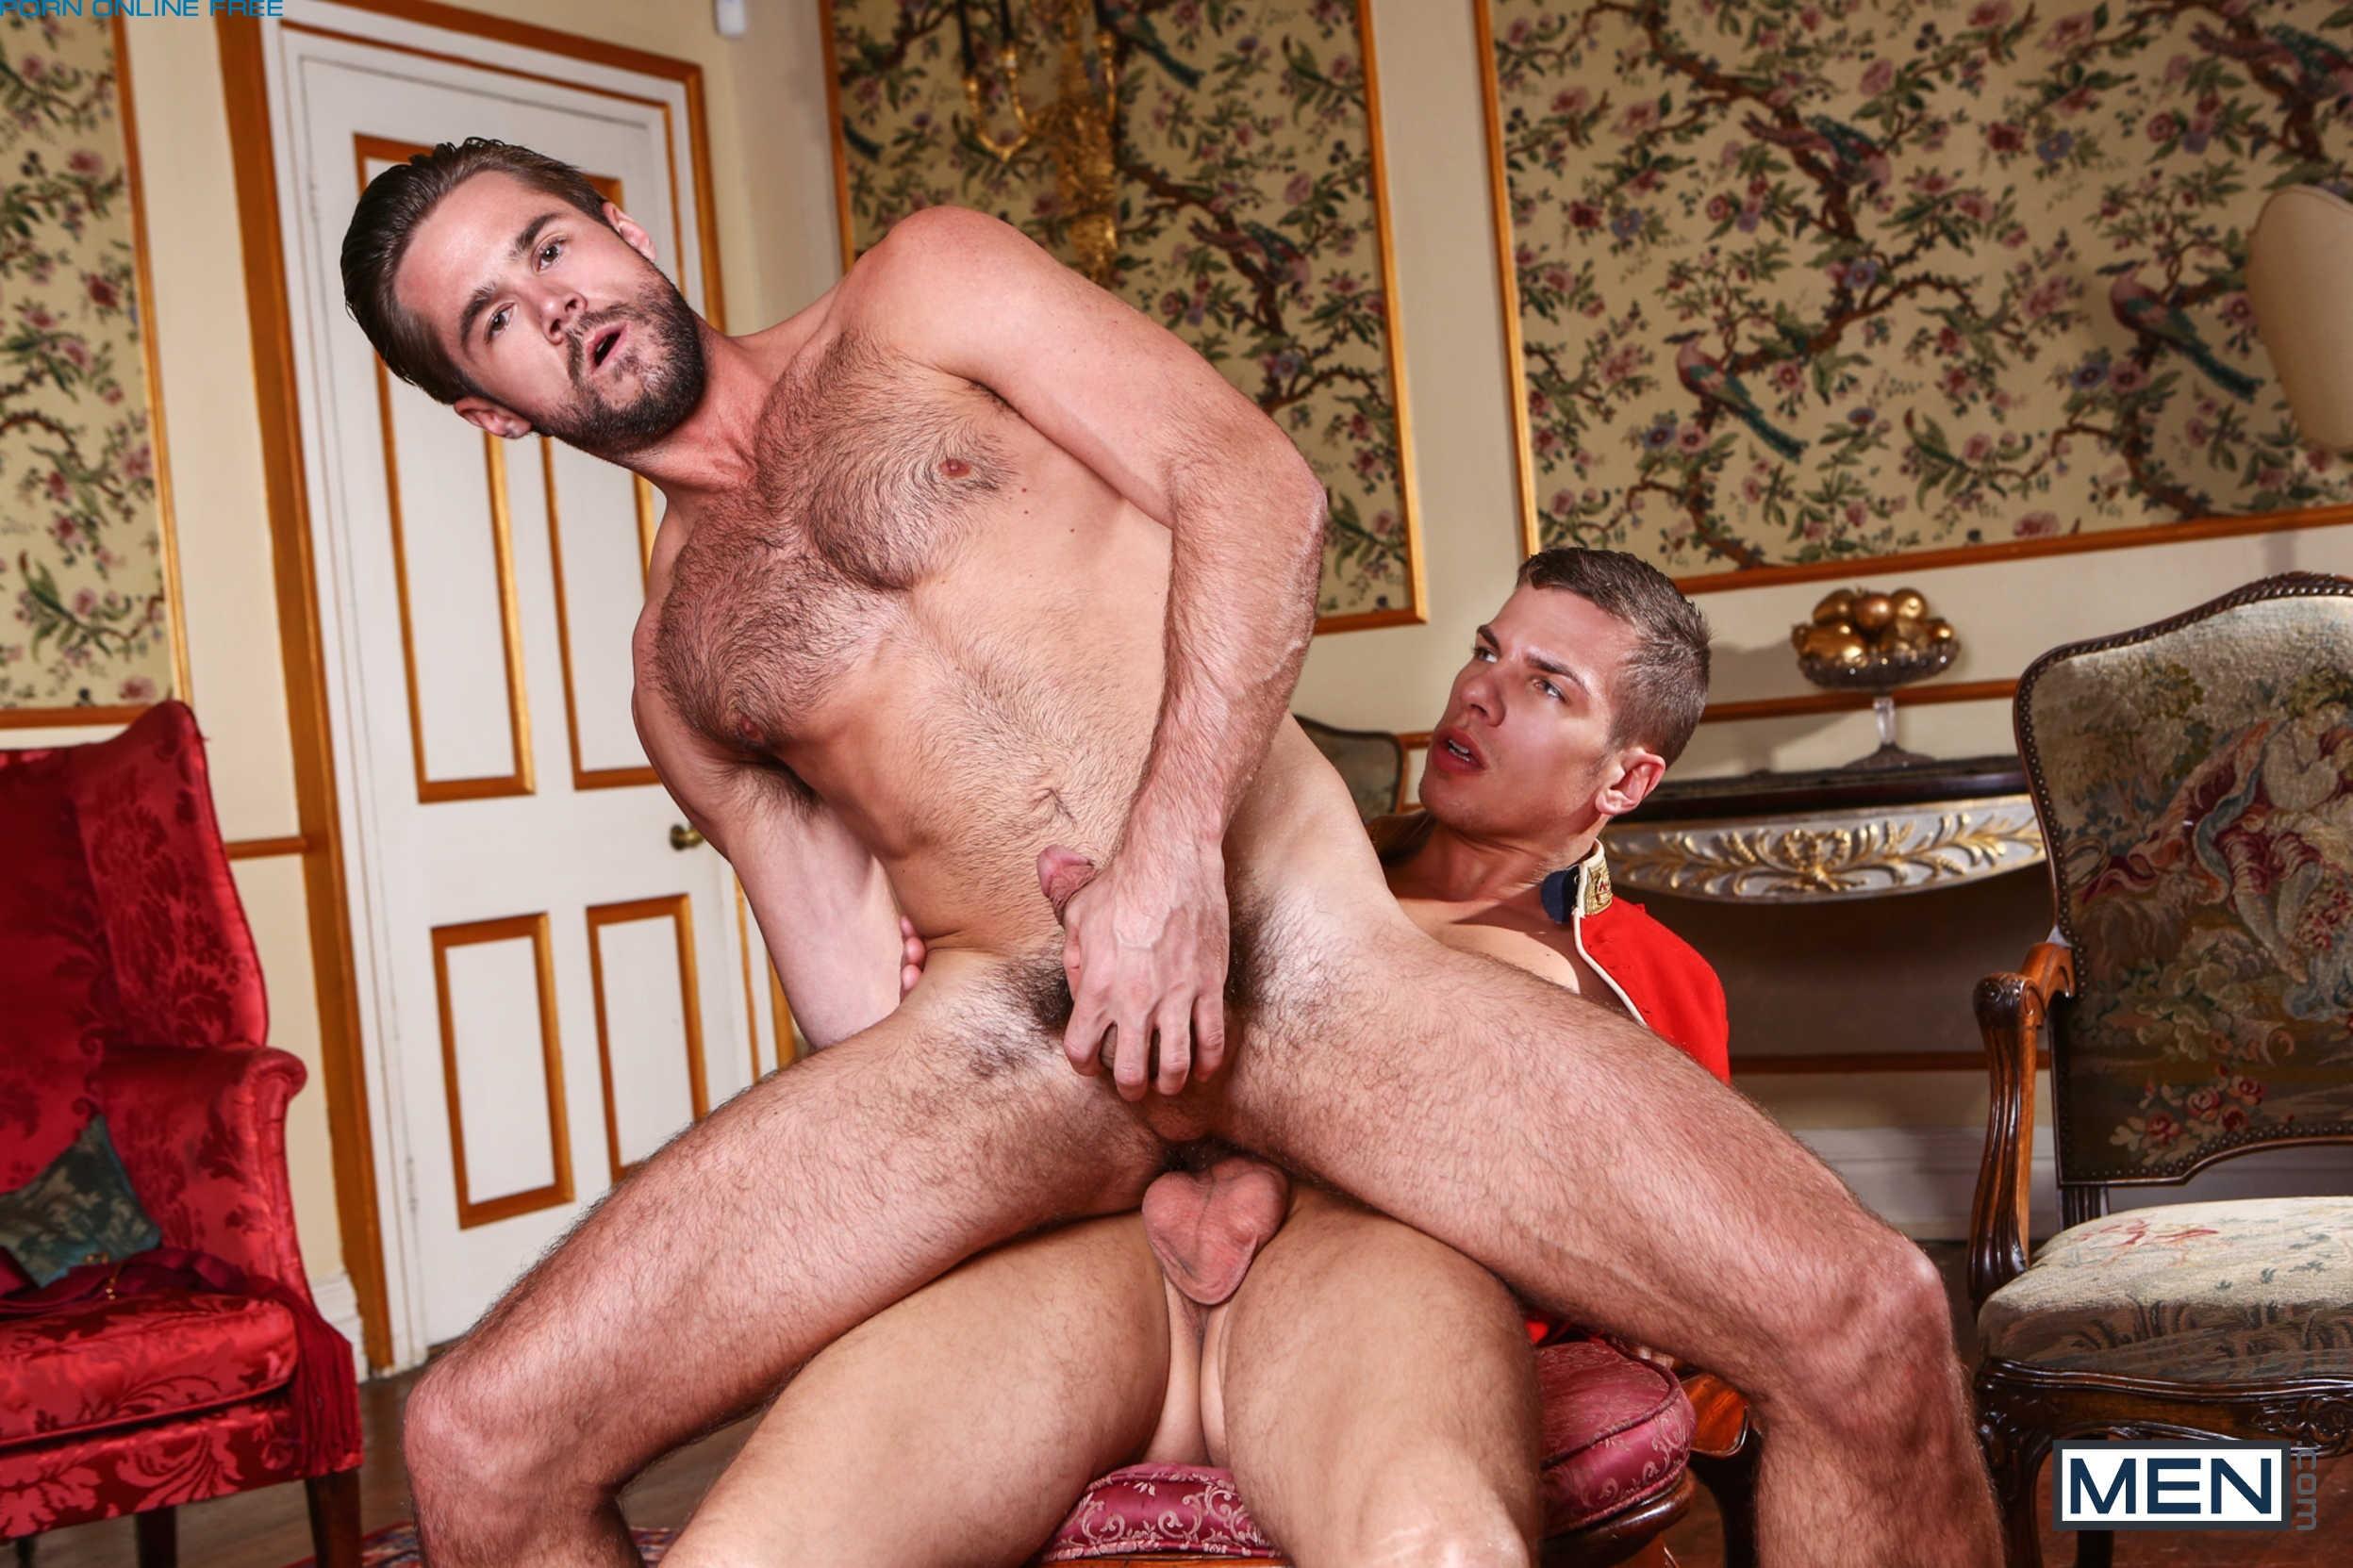 A Royal Fuckfest Gay Porn Free a royal fuckfest part 2 menofuk 2015 mike de marko gay porn